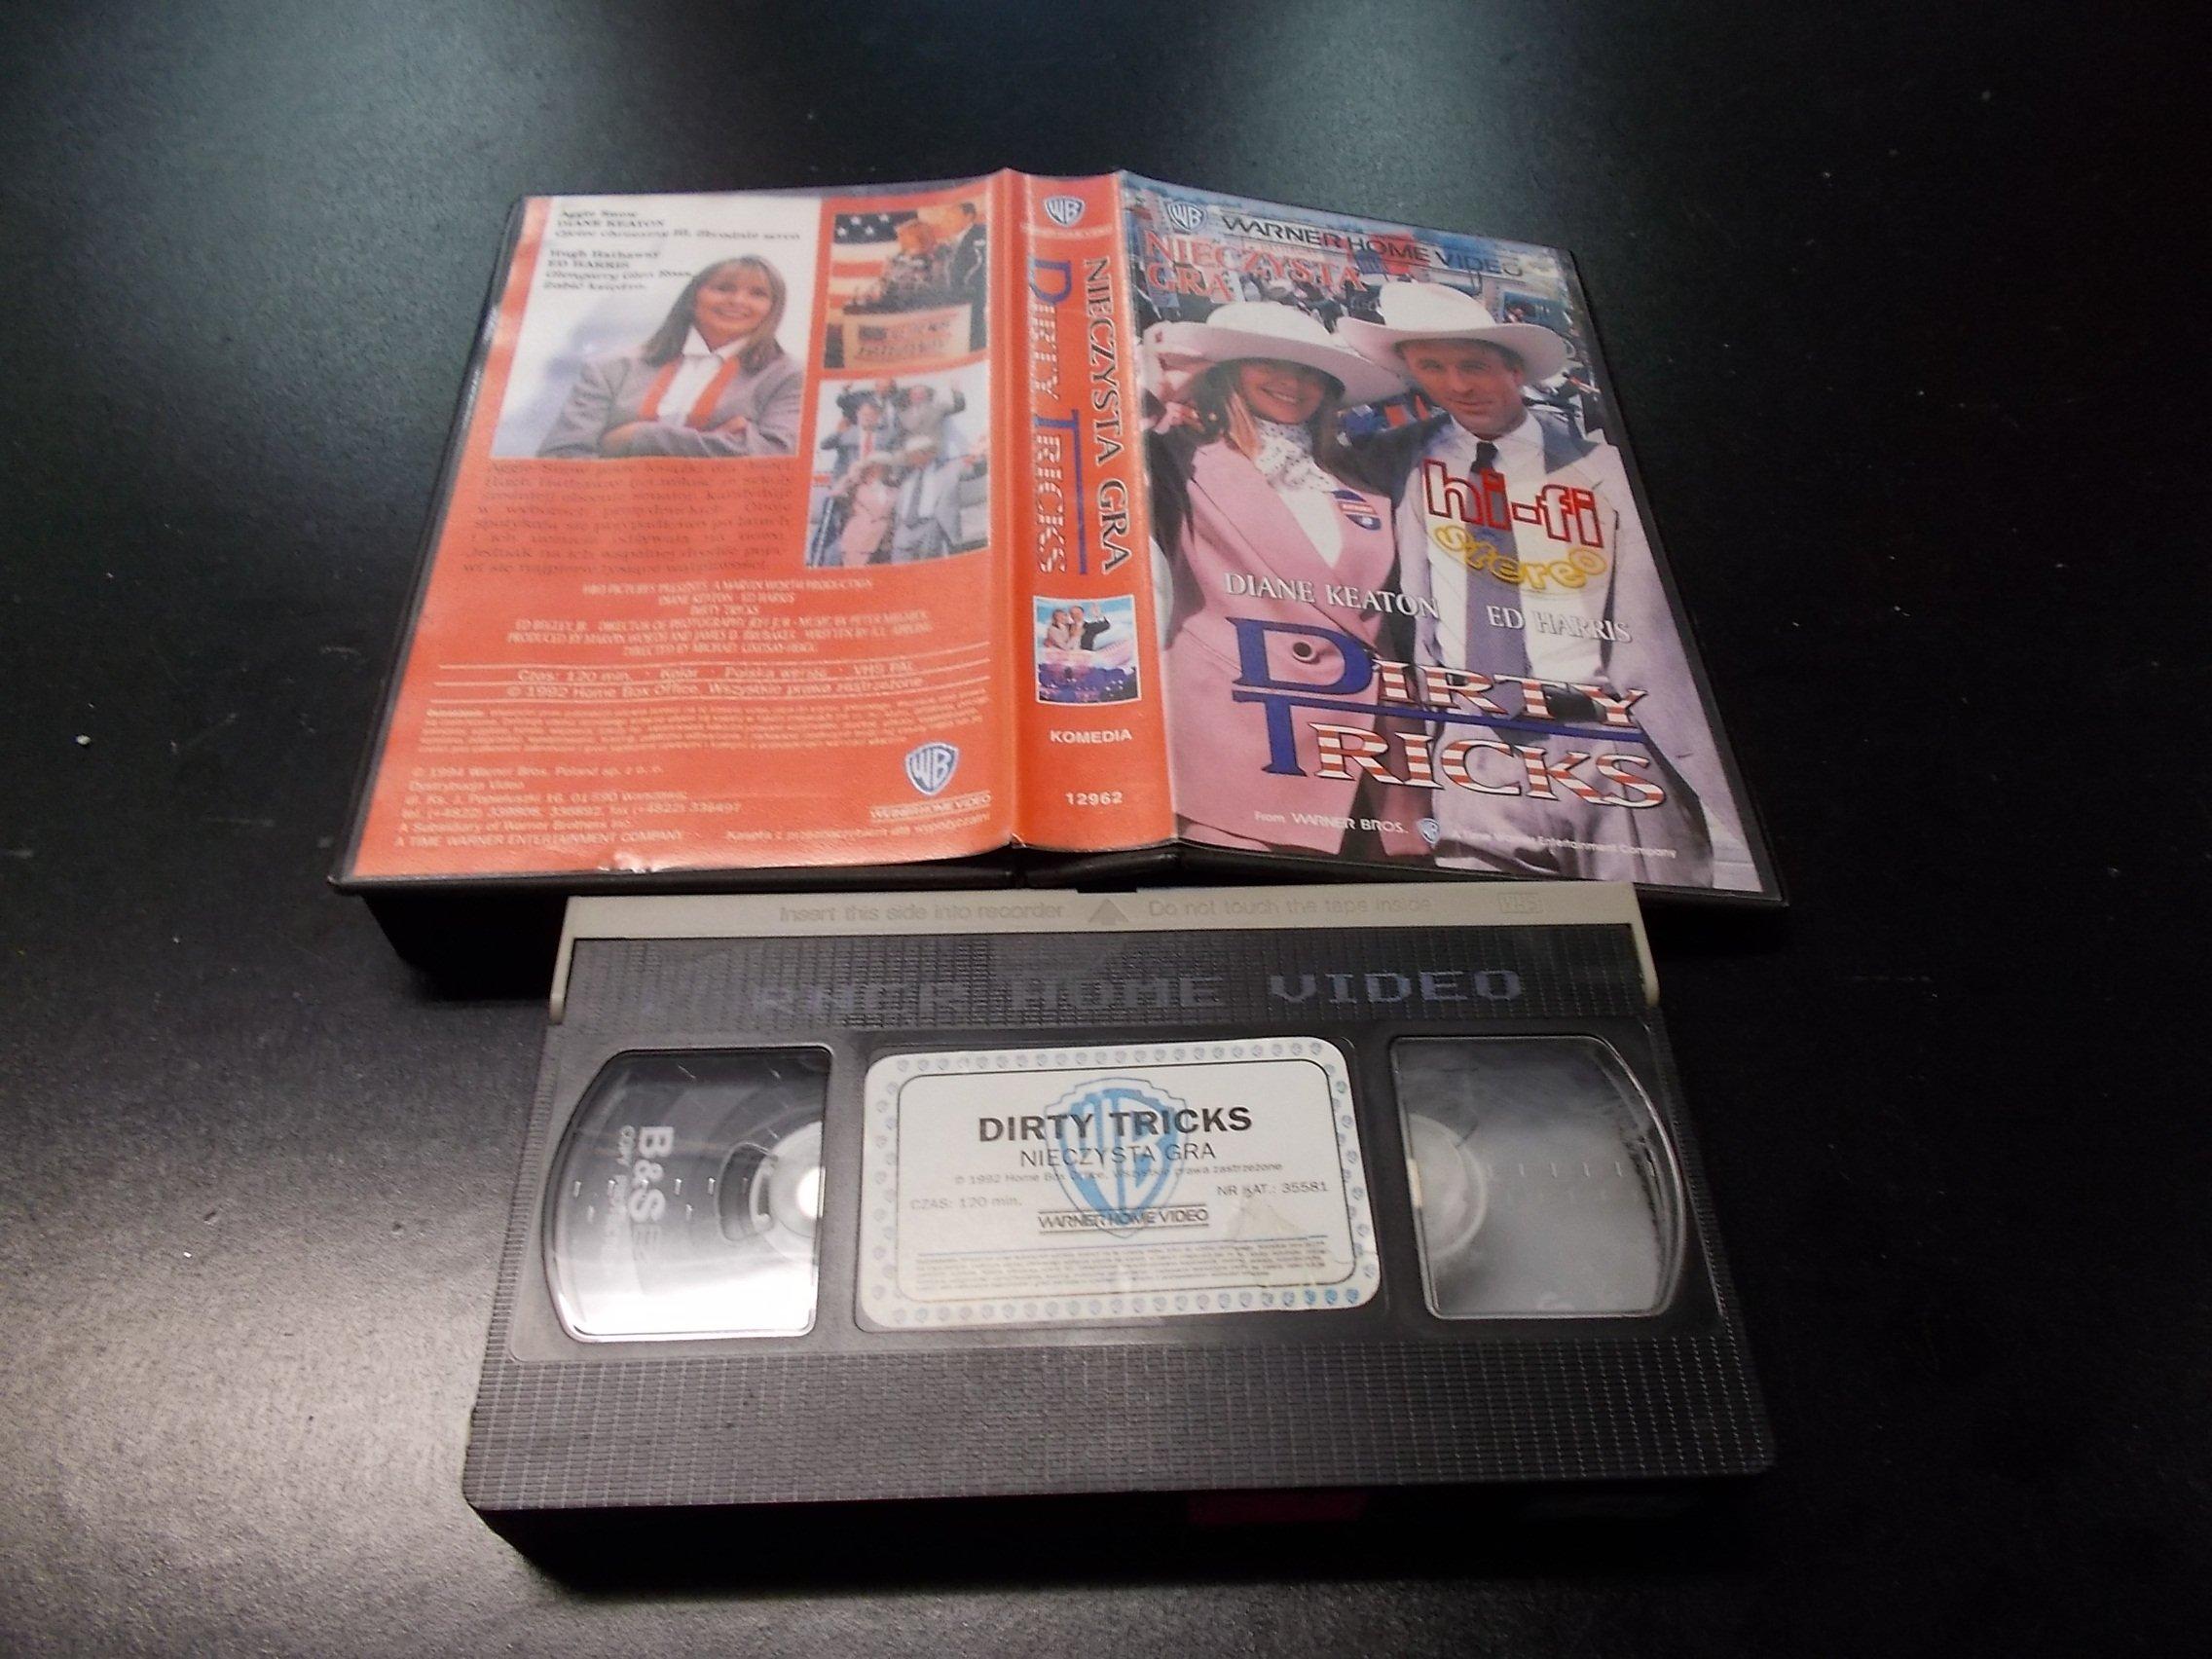 NIECZYSTA GRA -  kaseta VHS - 1232 Opole - AlleOpole.pl